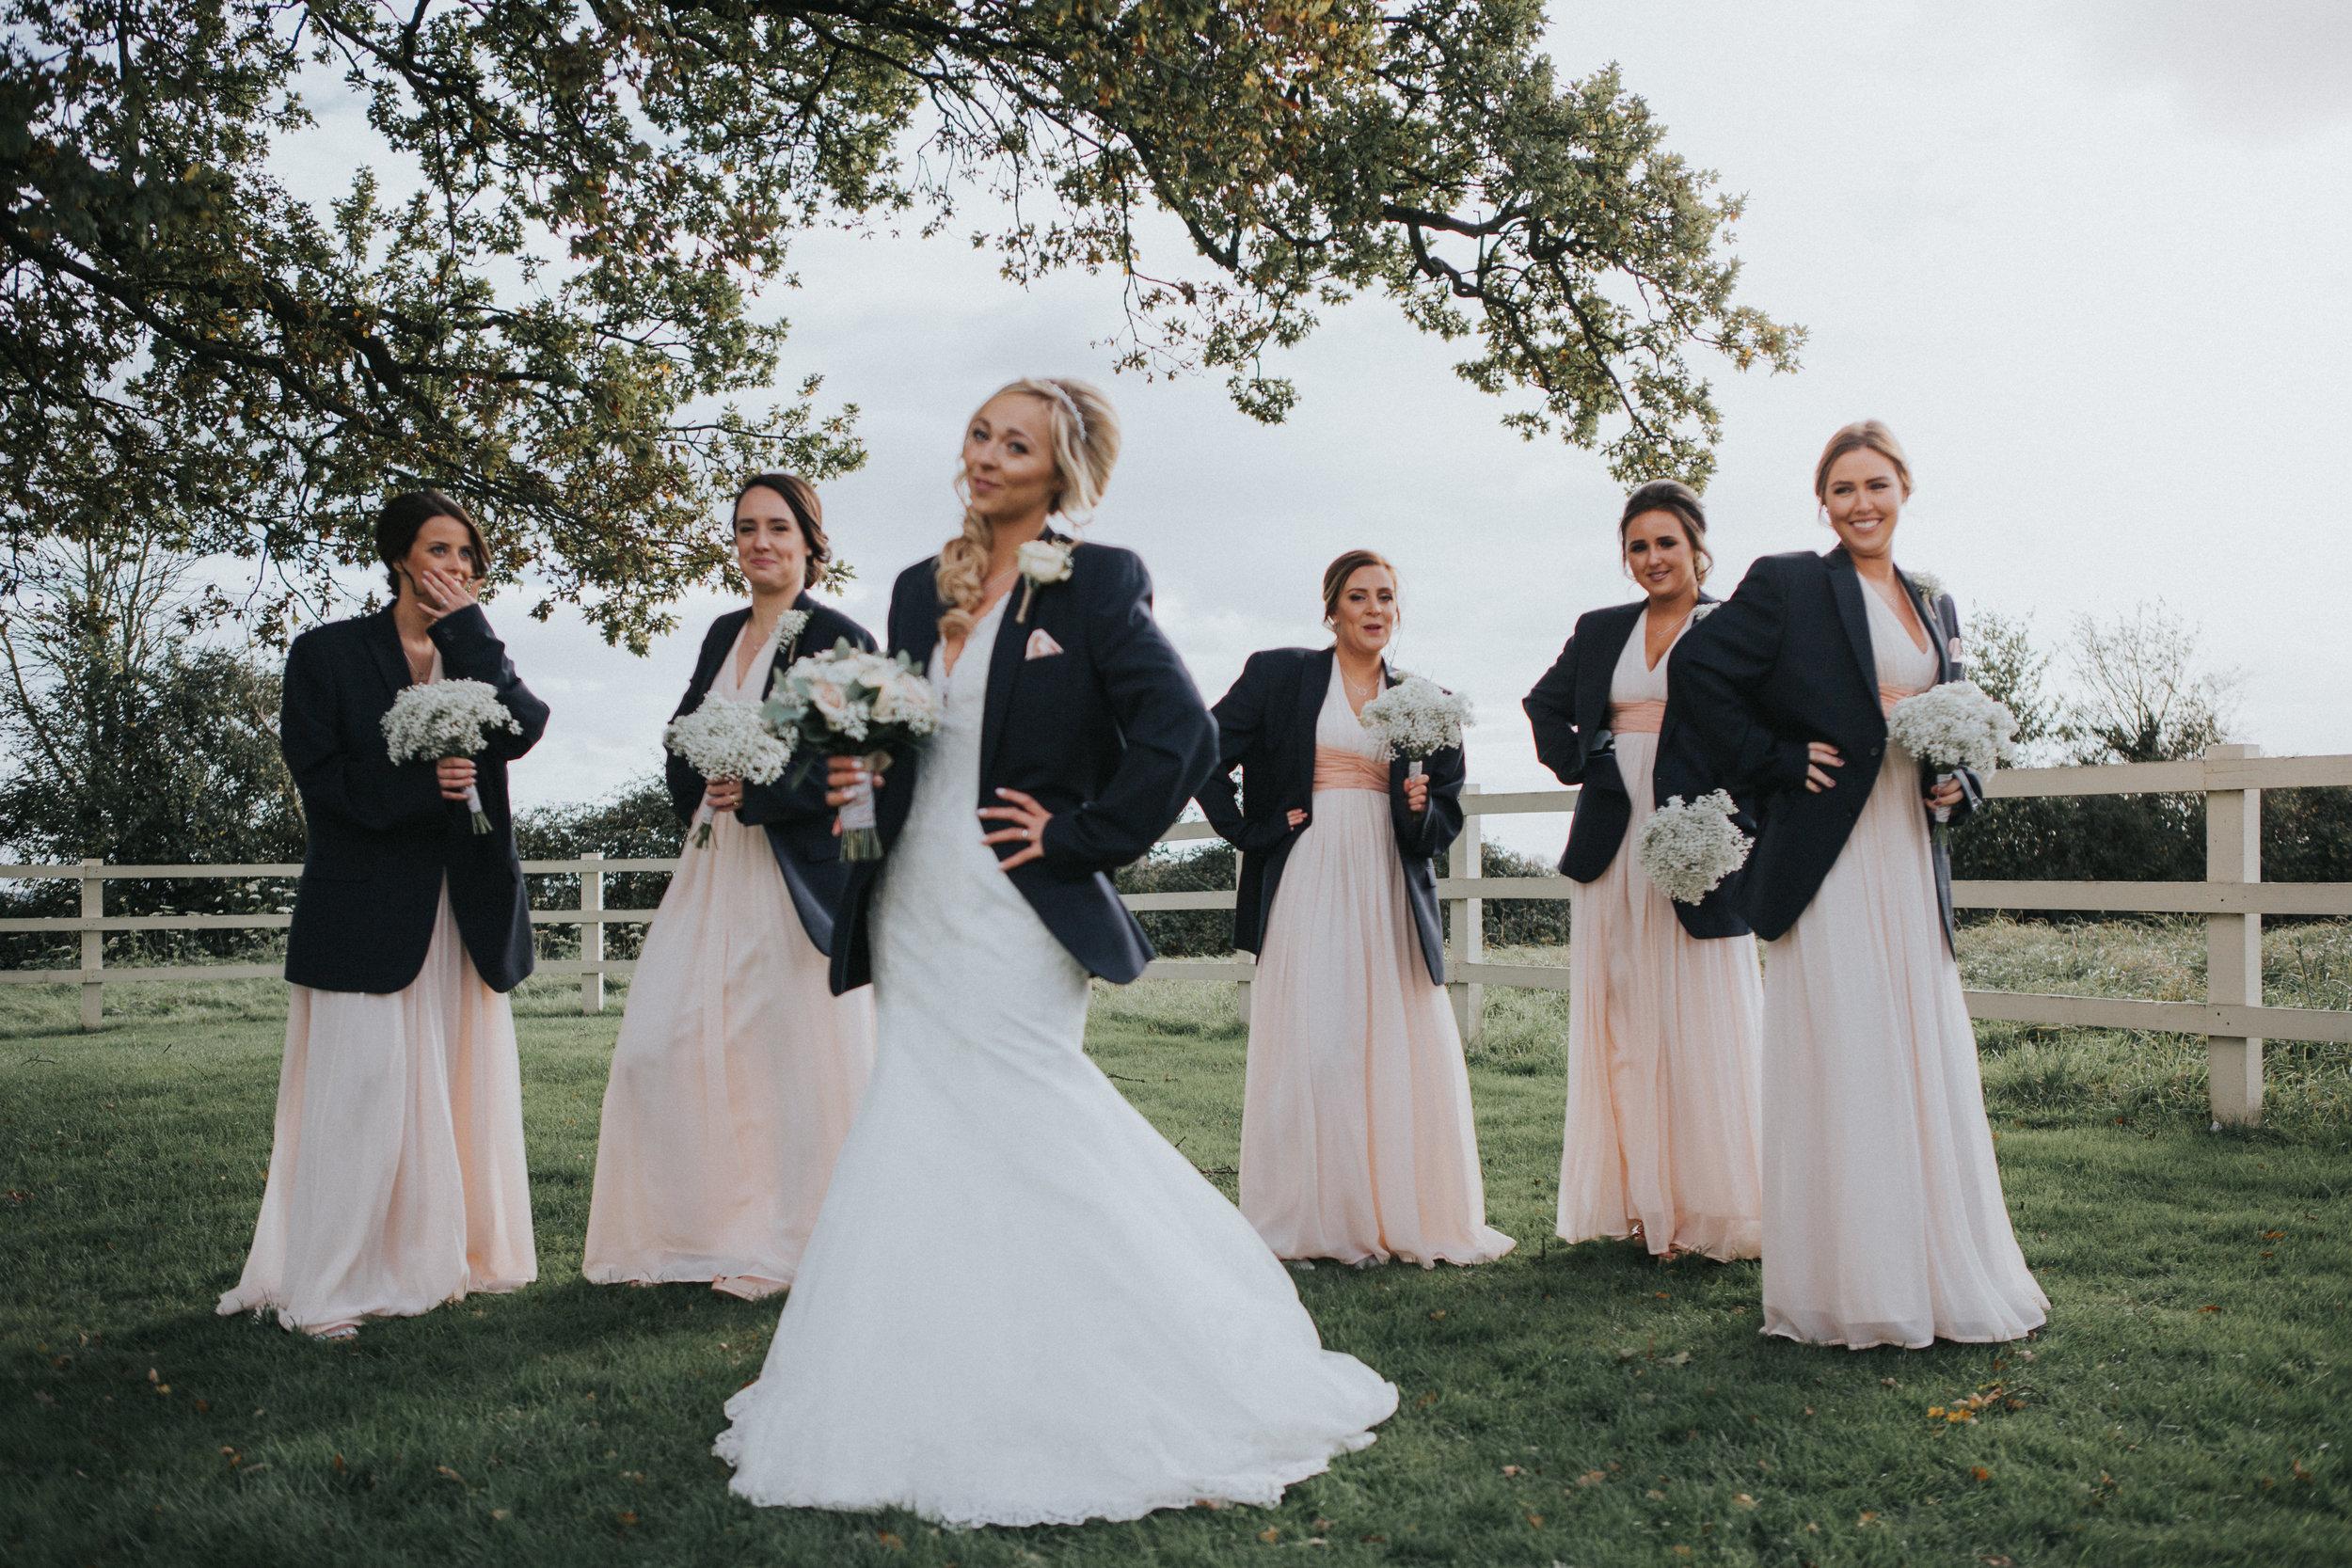 london-hertfordshire-wedding-photography-milling-barn-portrait-503